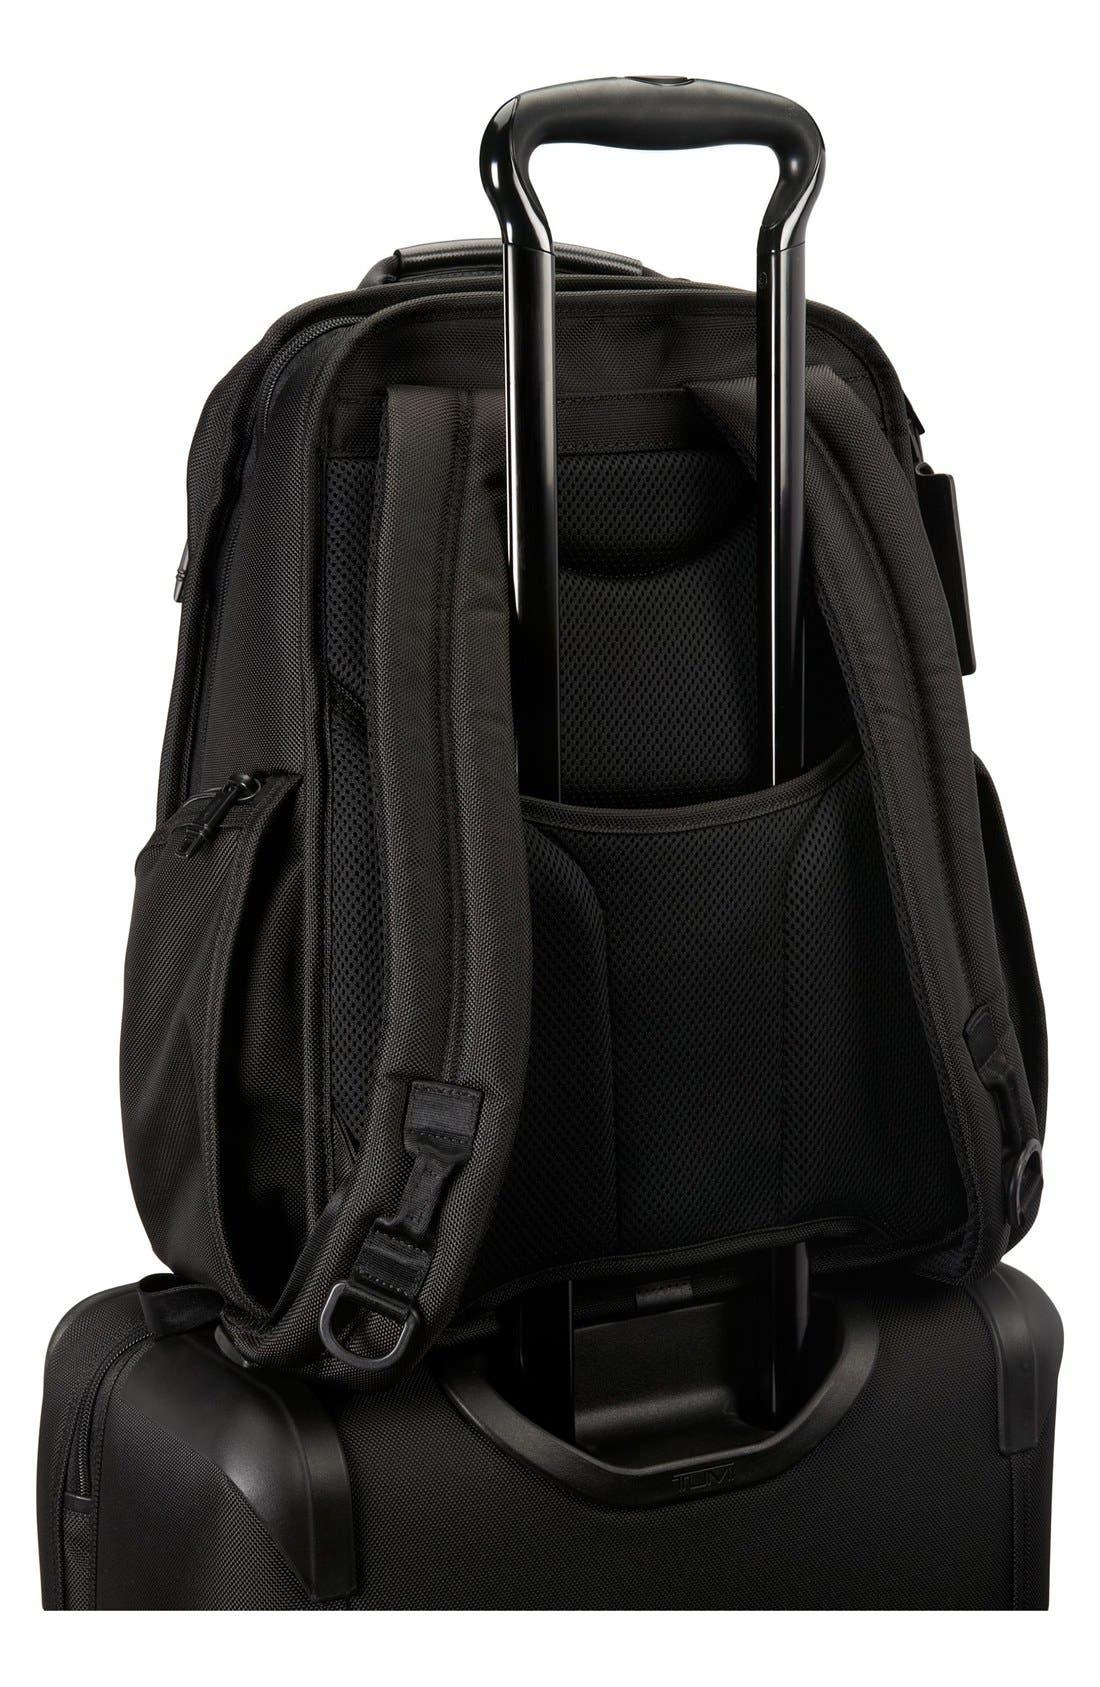 Alpha 2 Compact Laptop Brief Pack<sup>®</sup>,                             Alternate thumbnail 3, color,                             Black